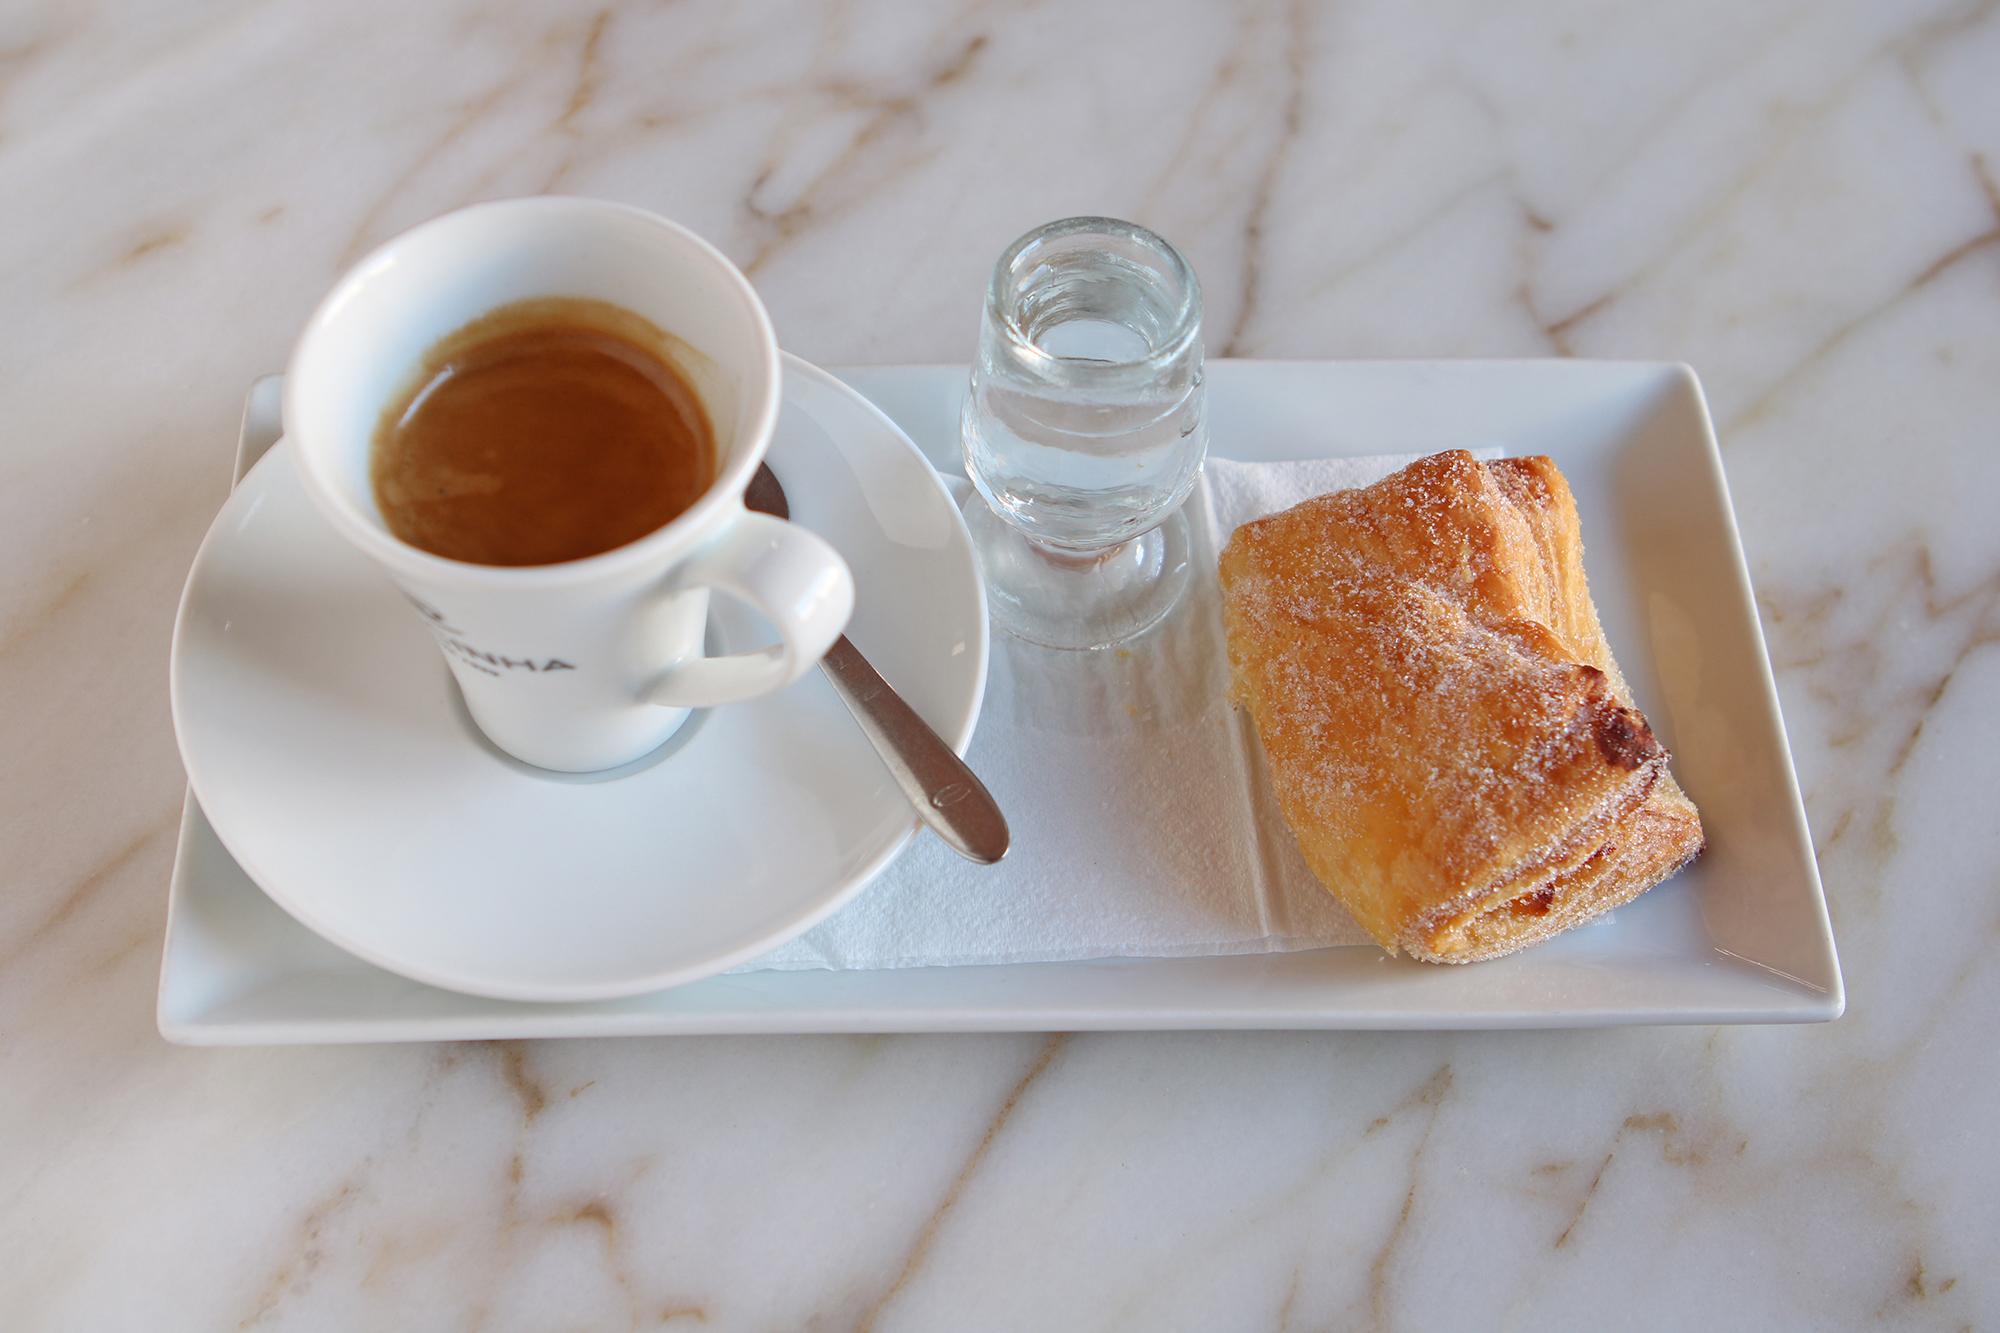 Cafe_Medronho_Doce2_peq